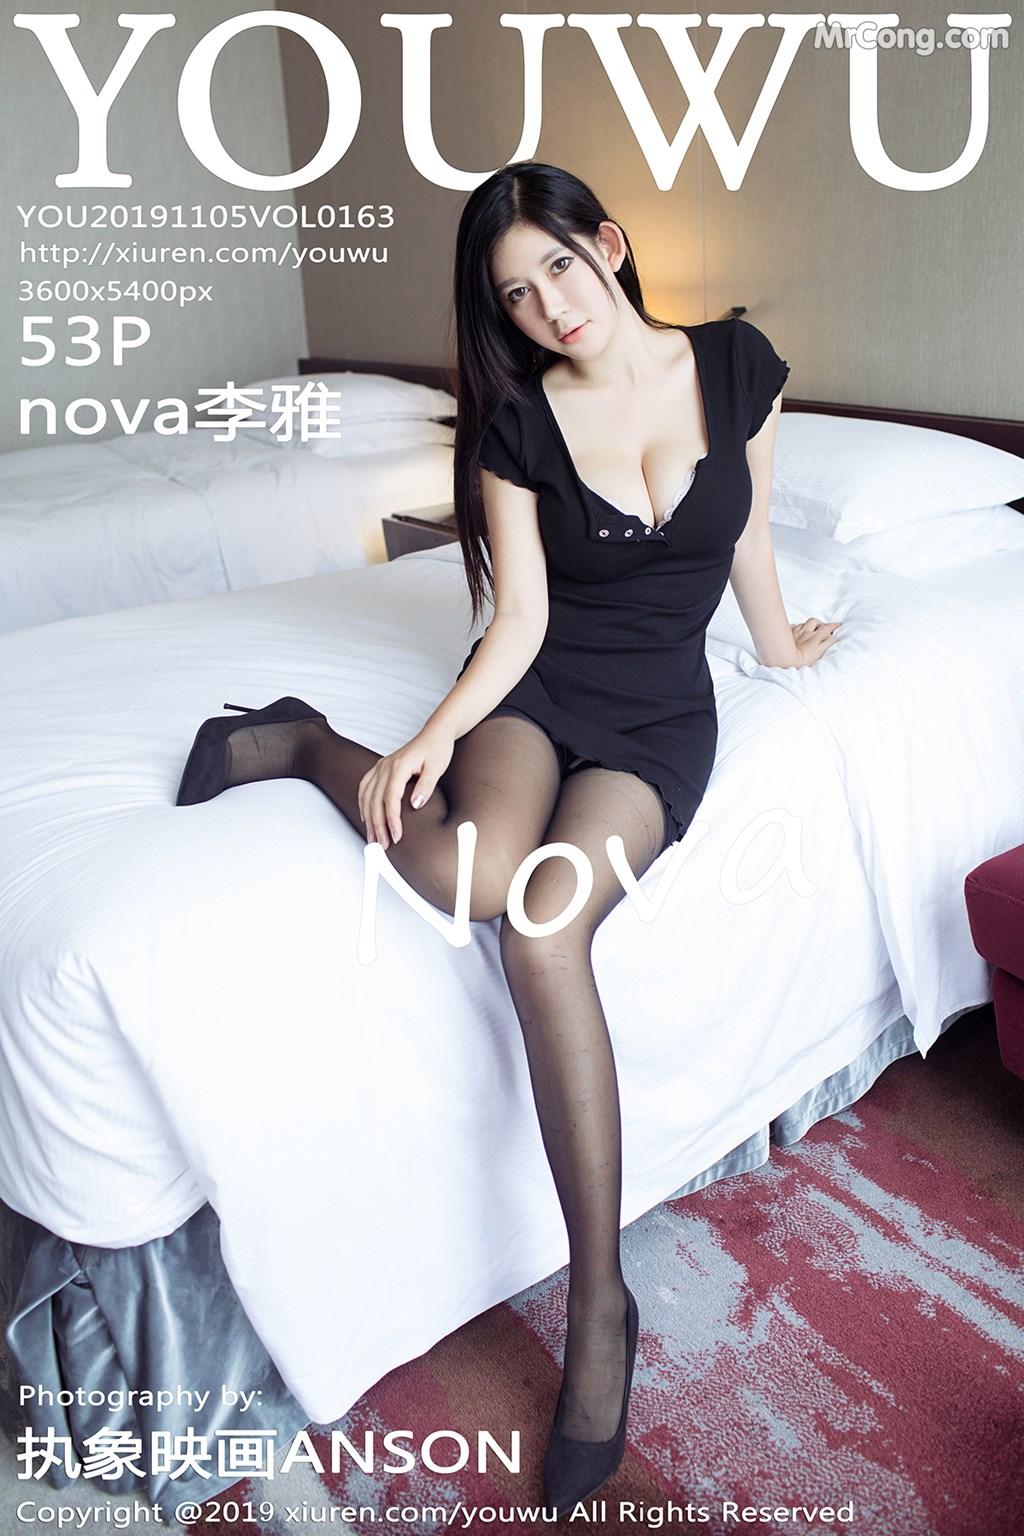 YouWu Vol.163: nova李雅 (54 ảnh)